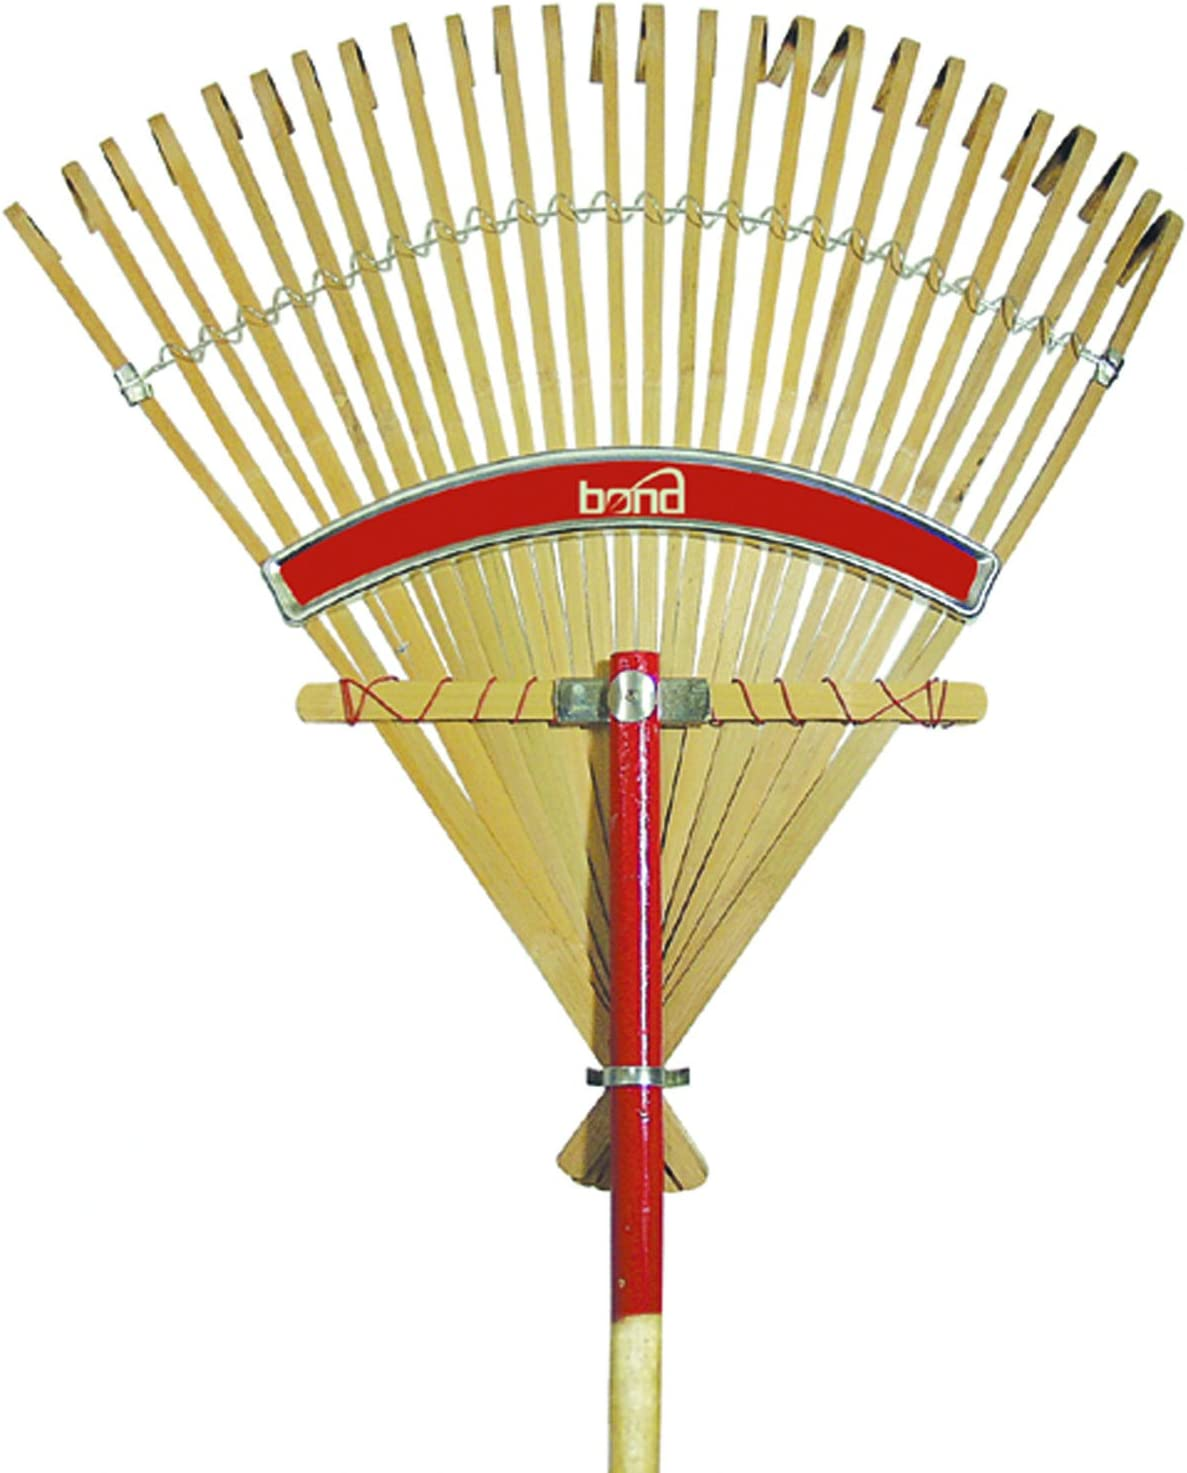 Flexrake CFP24 24-Inch Bamboo Rake with 48-Inch Wood Handle